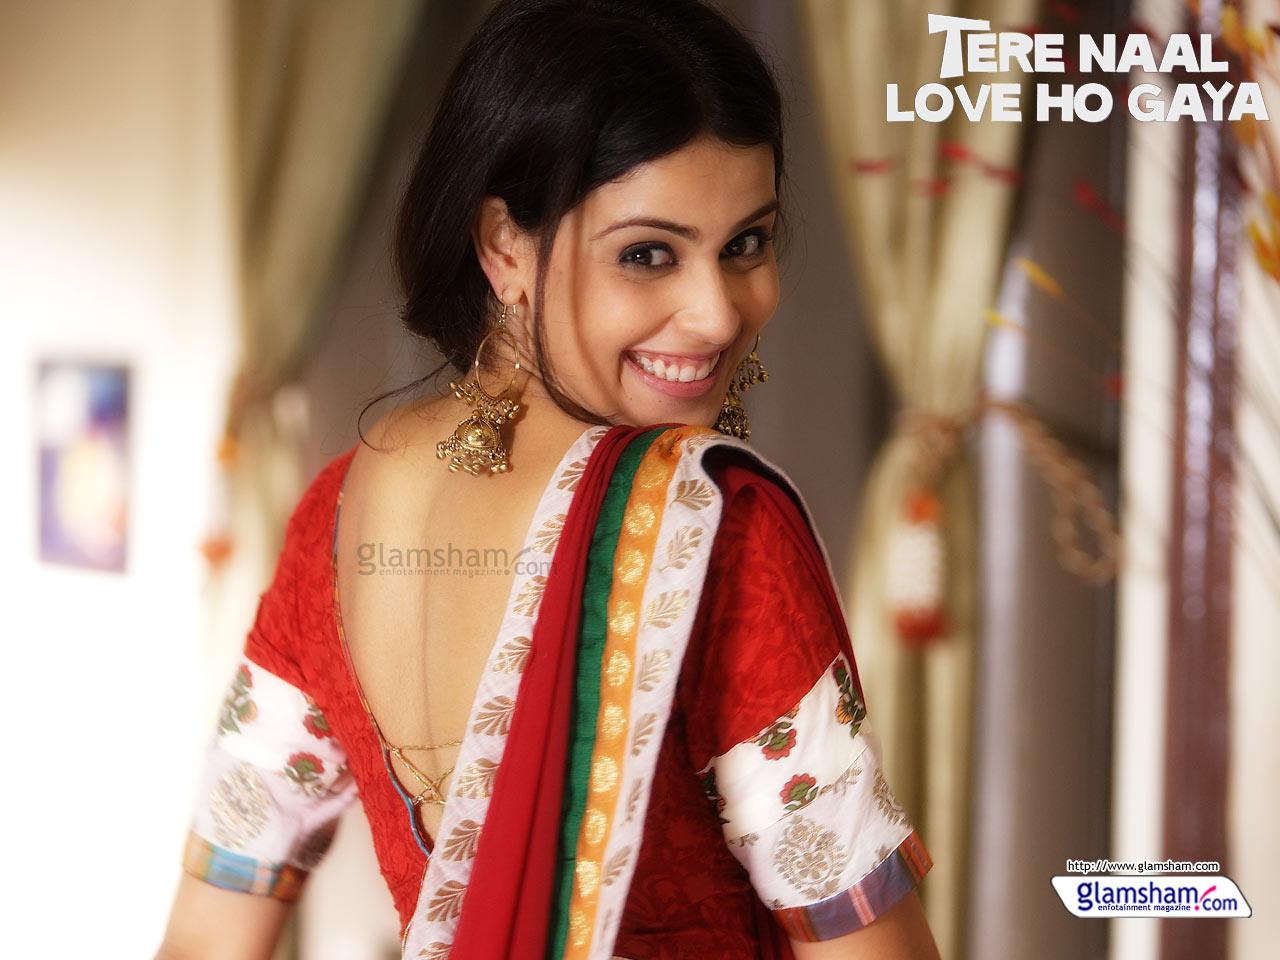 genelia d'souza :most cutest one images tere naal love ho gaya hd